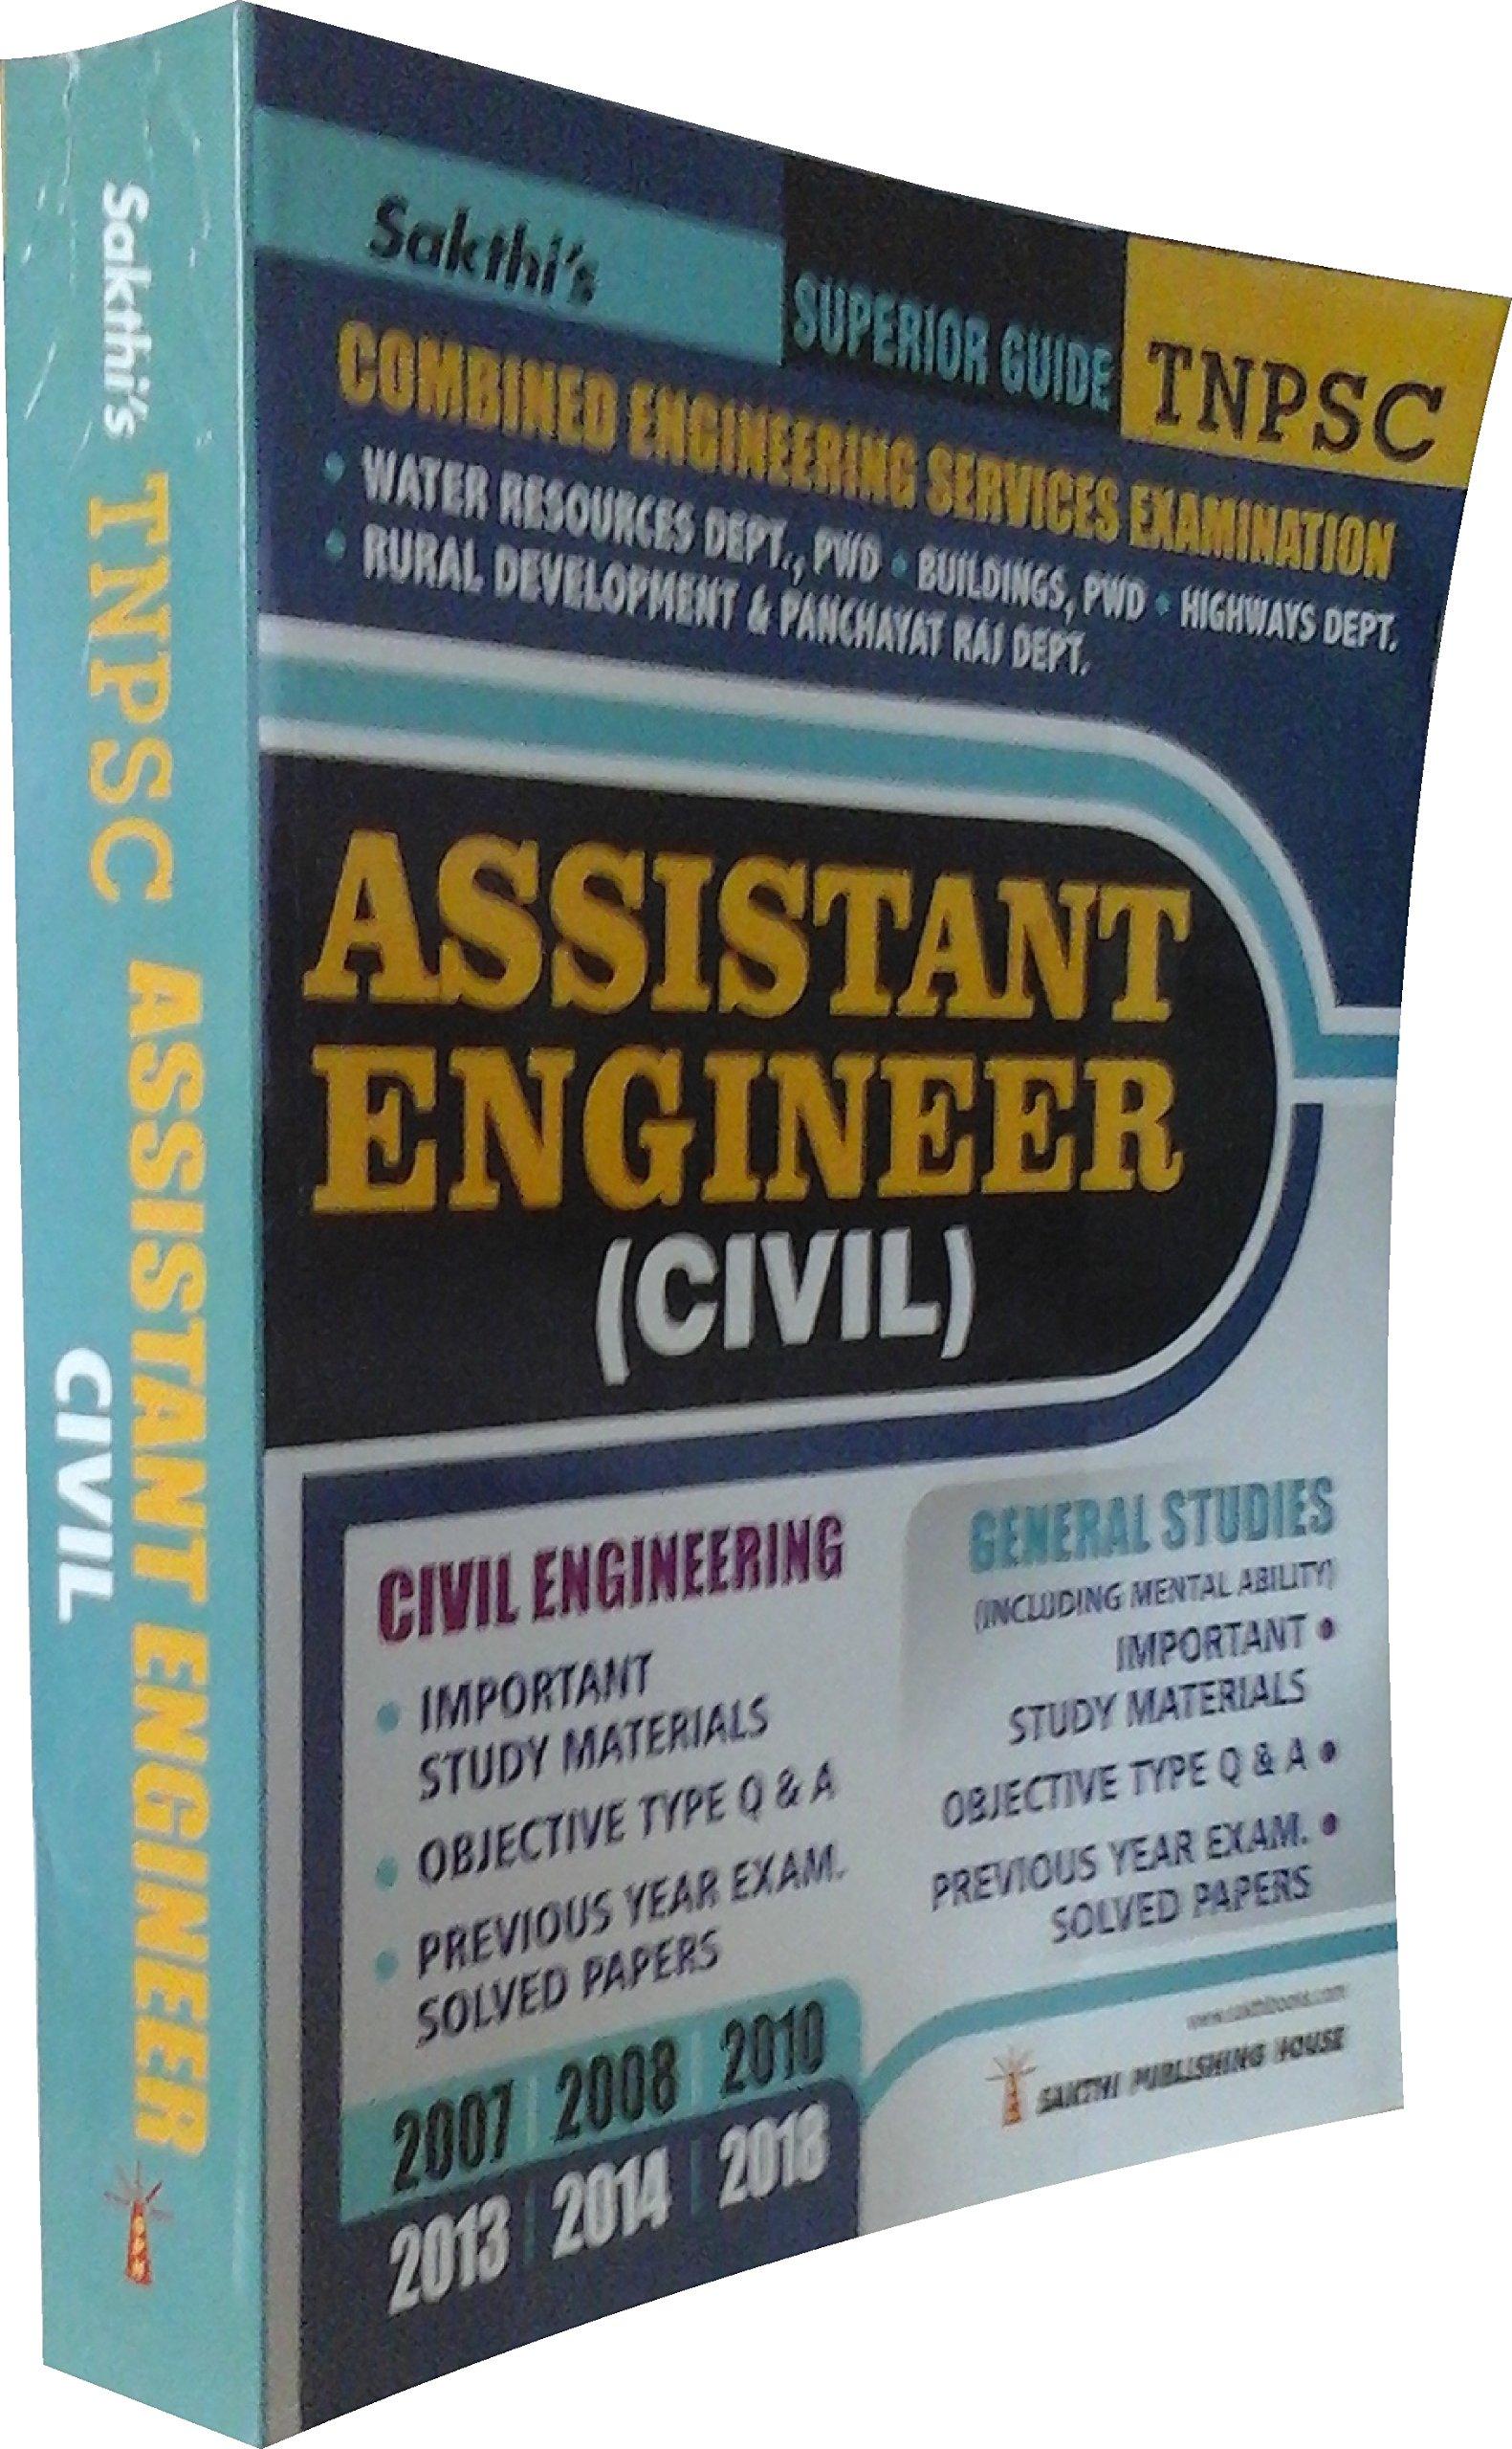 buy tnpsc assistant engineer civil civil engineering general rh amazon in Cicerone Exam Study Guide Exam Study Guide Brady Michael Morton